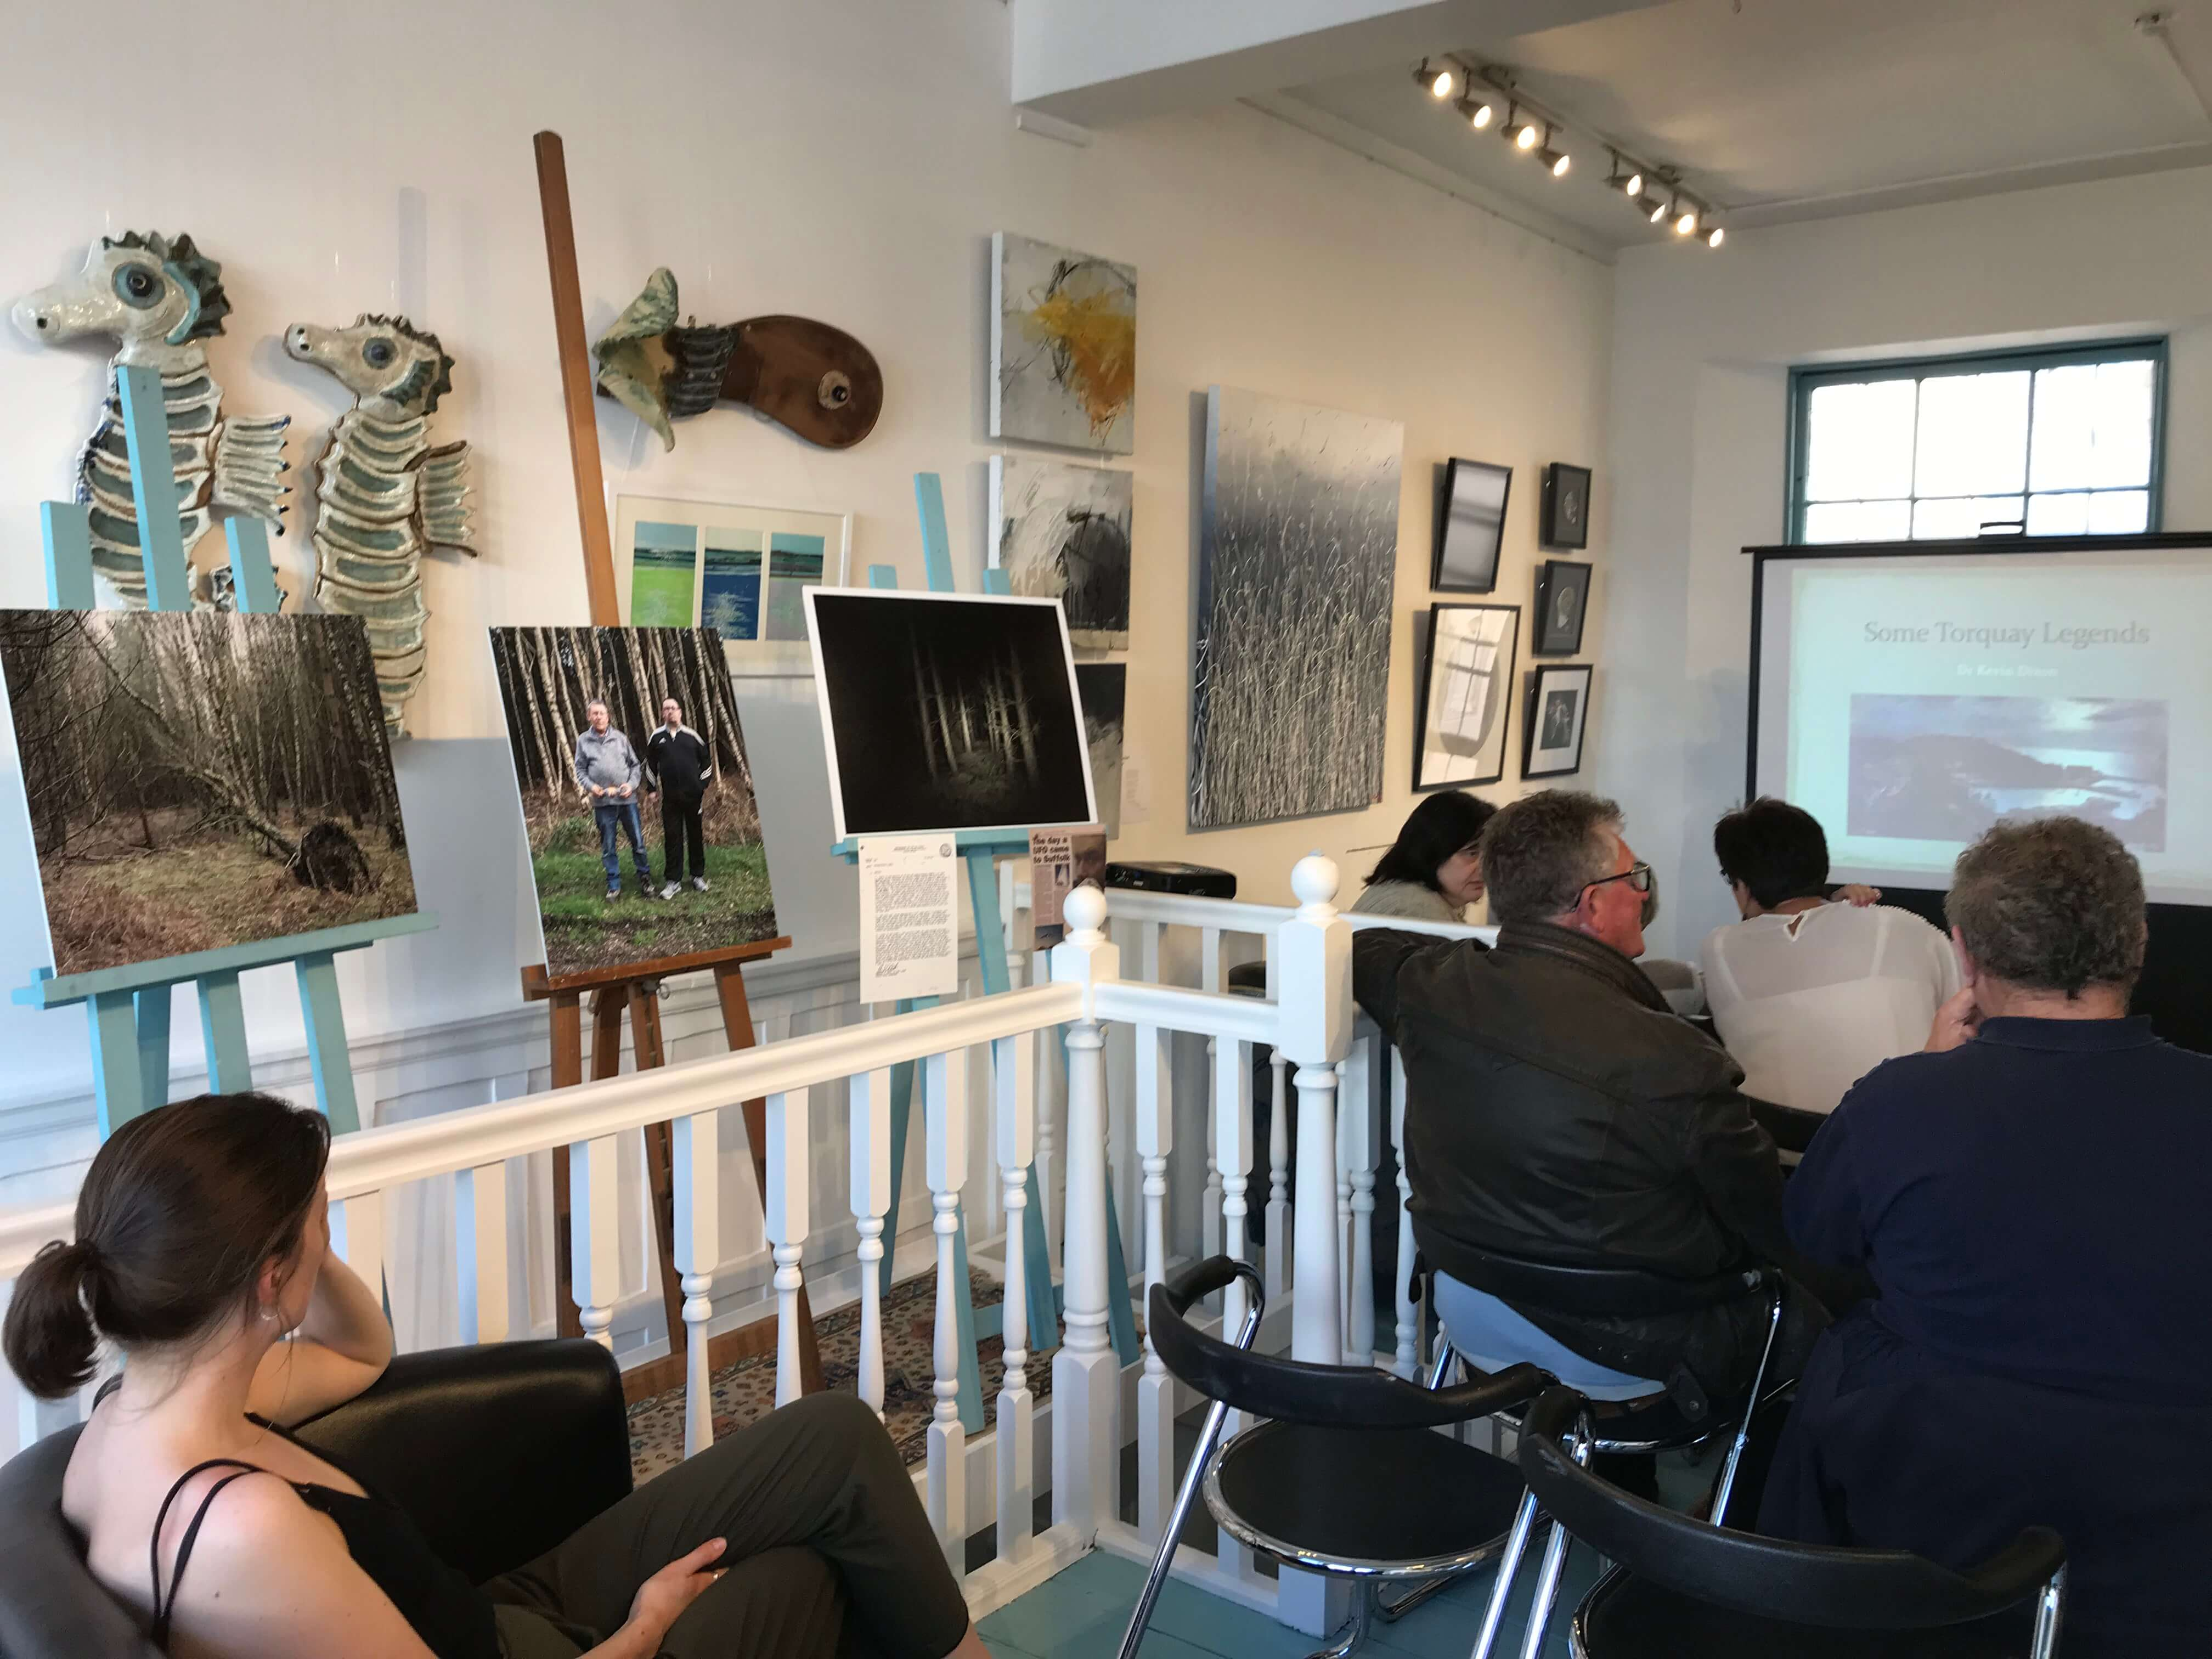 Kevin Dixon local history talk at the artisan gallery